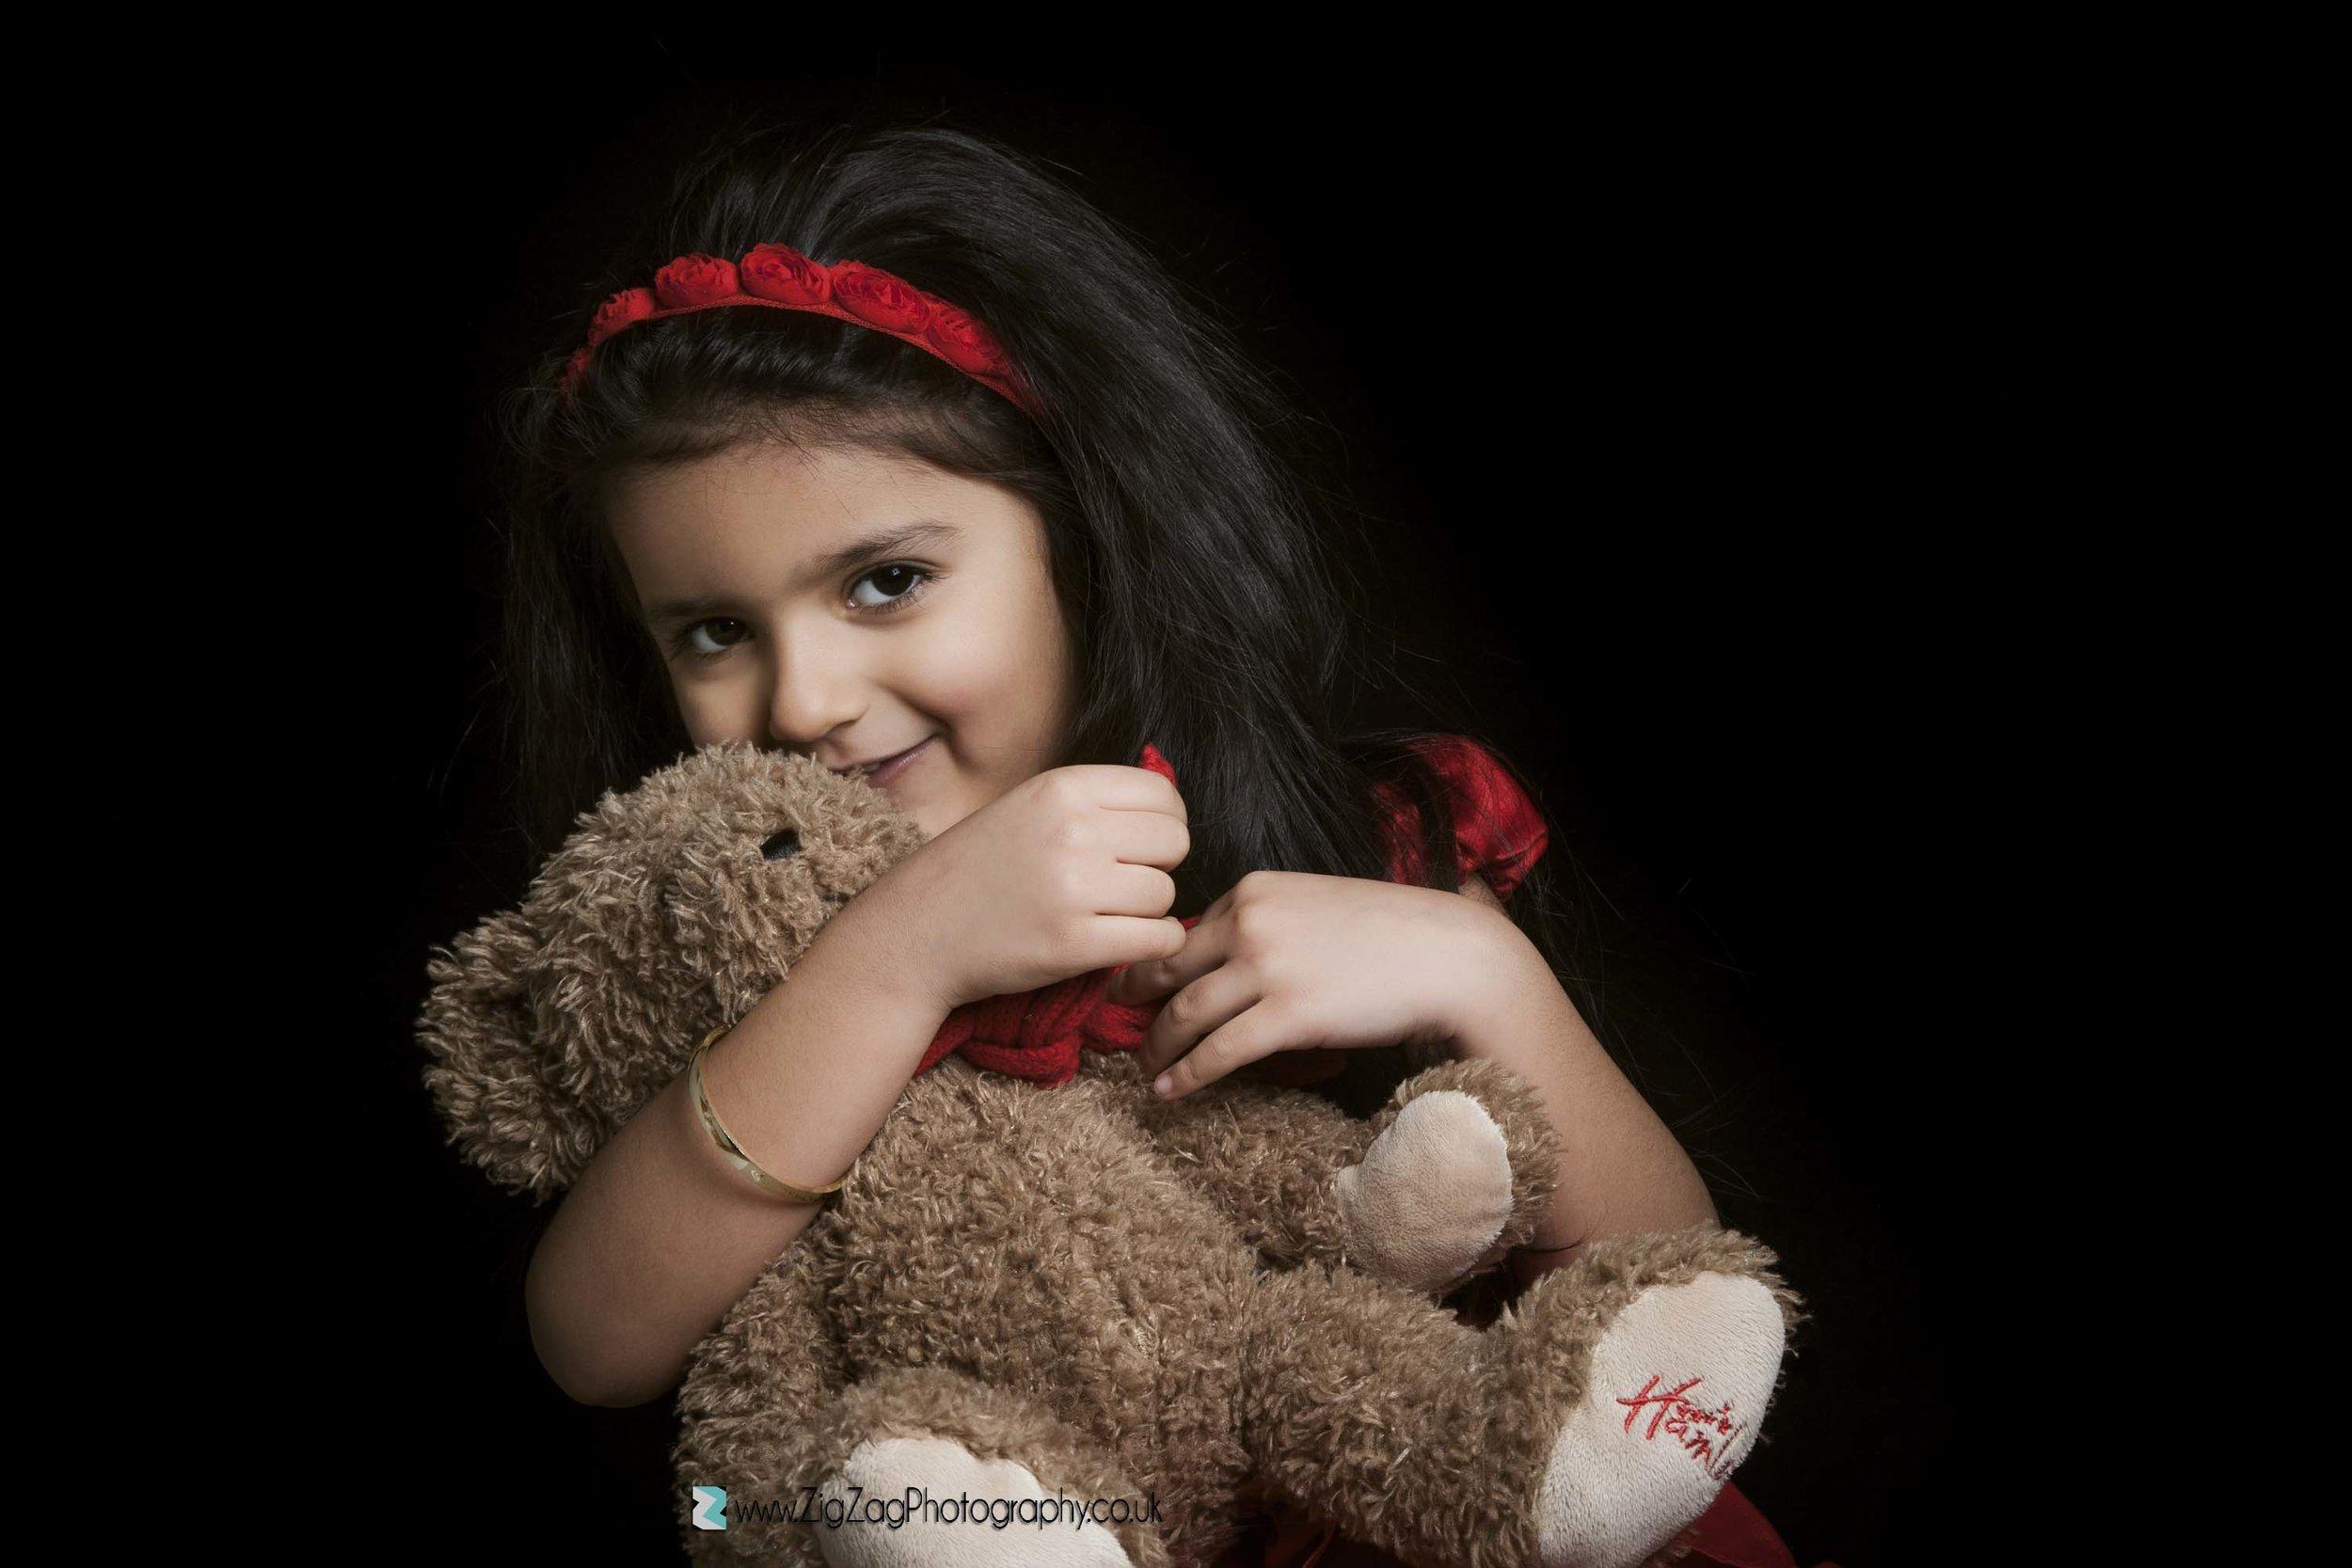 photograpjhy-studio-leicester-photoshoot-kids-girl-red-headband-teddy-bear-ideas-props.jpg